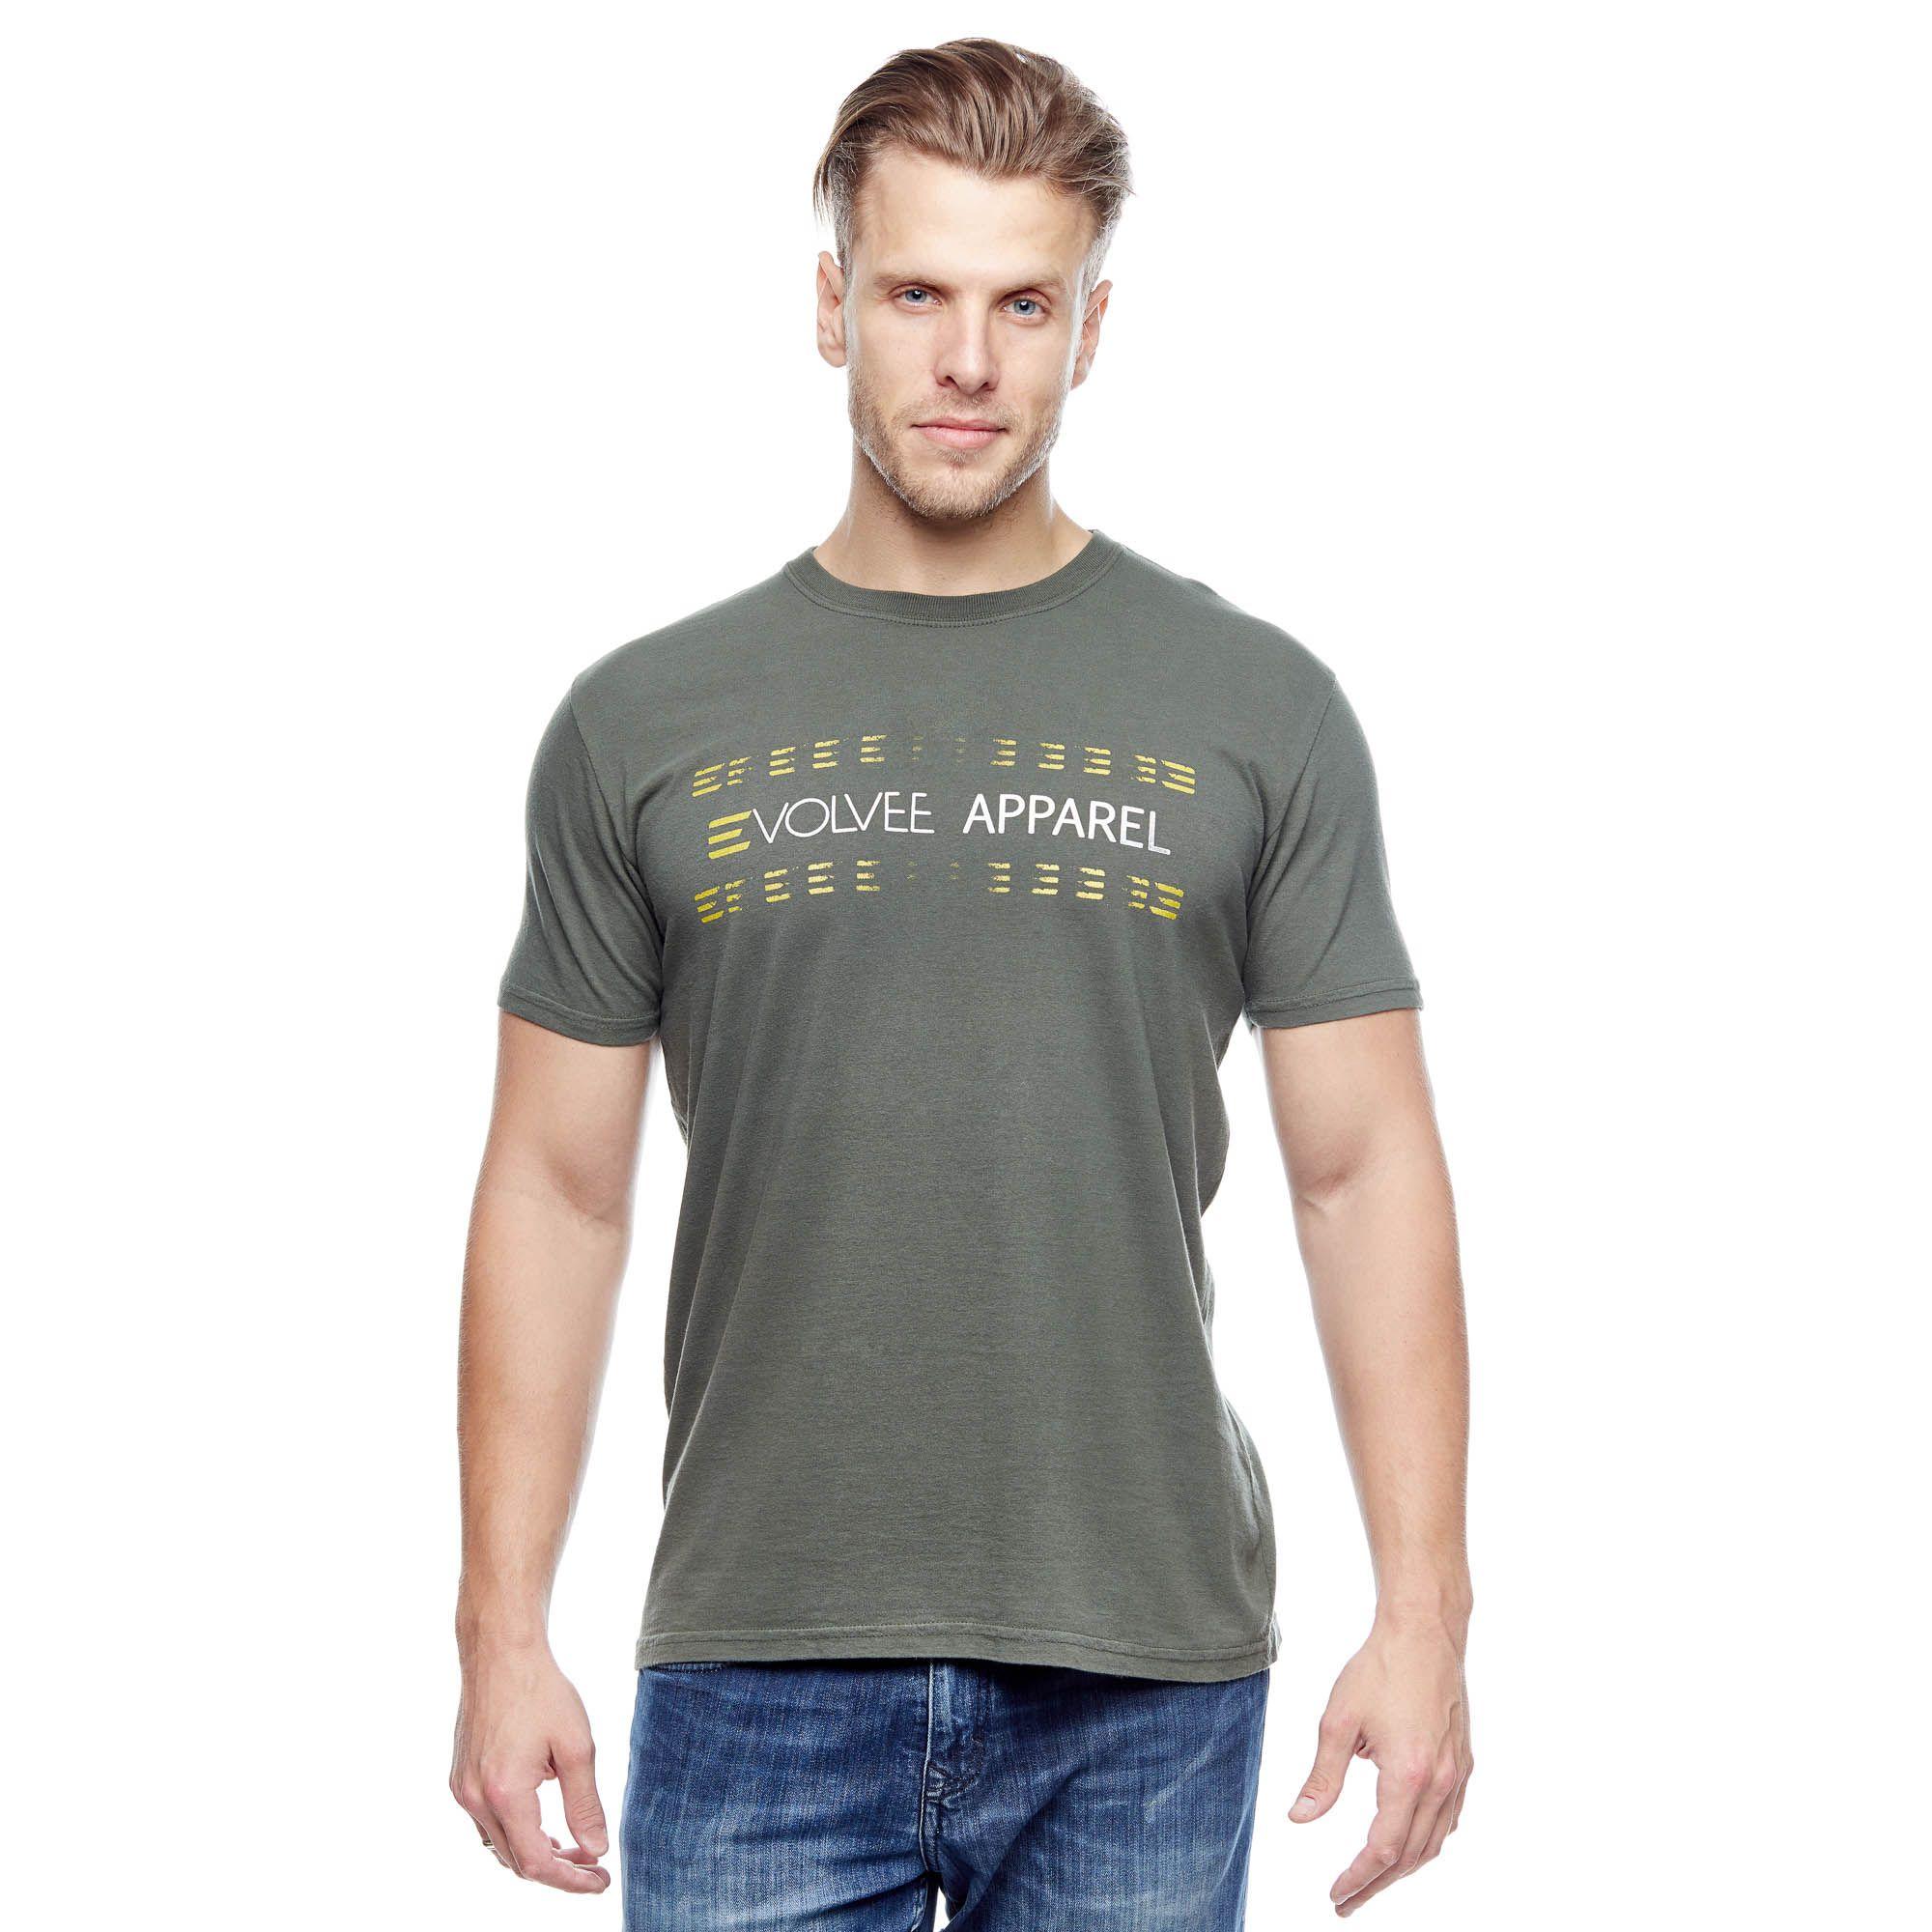 Camiseta Evolvee Apparel Masculina